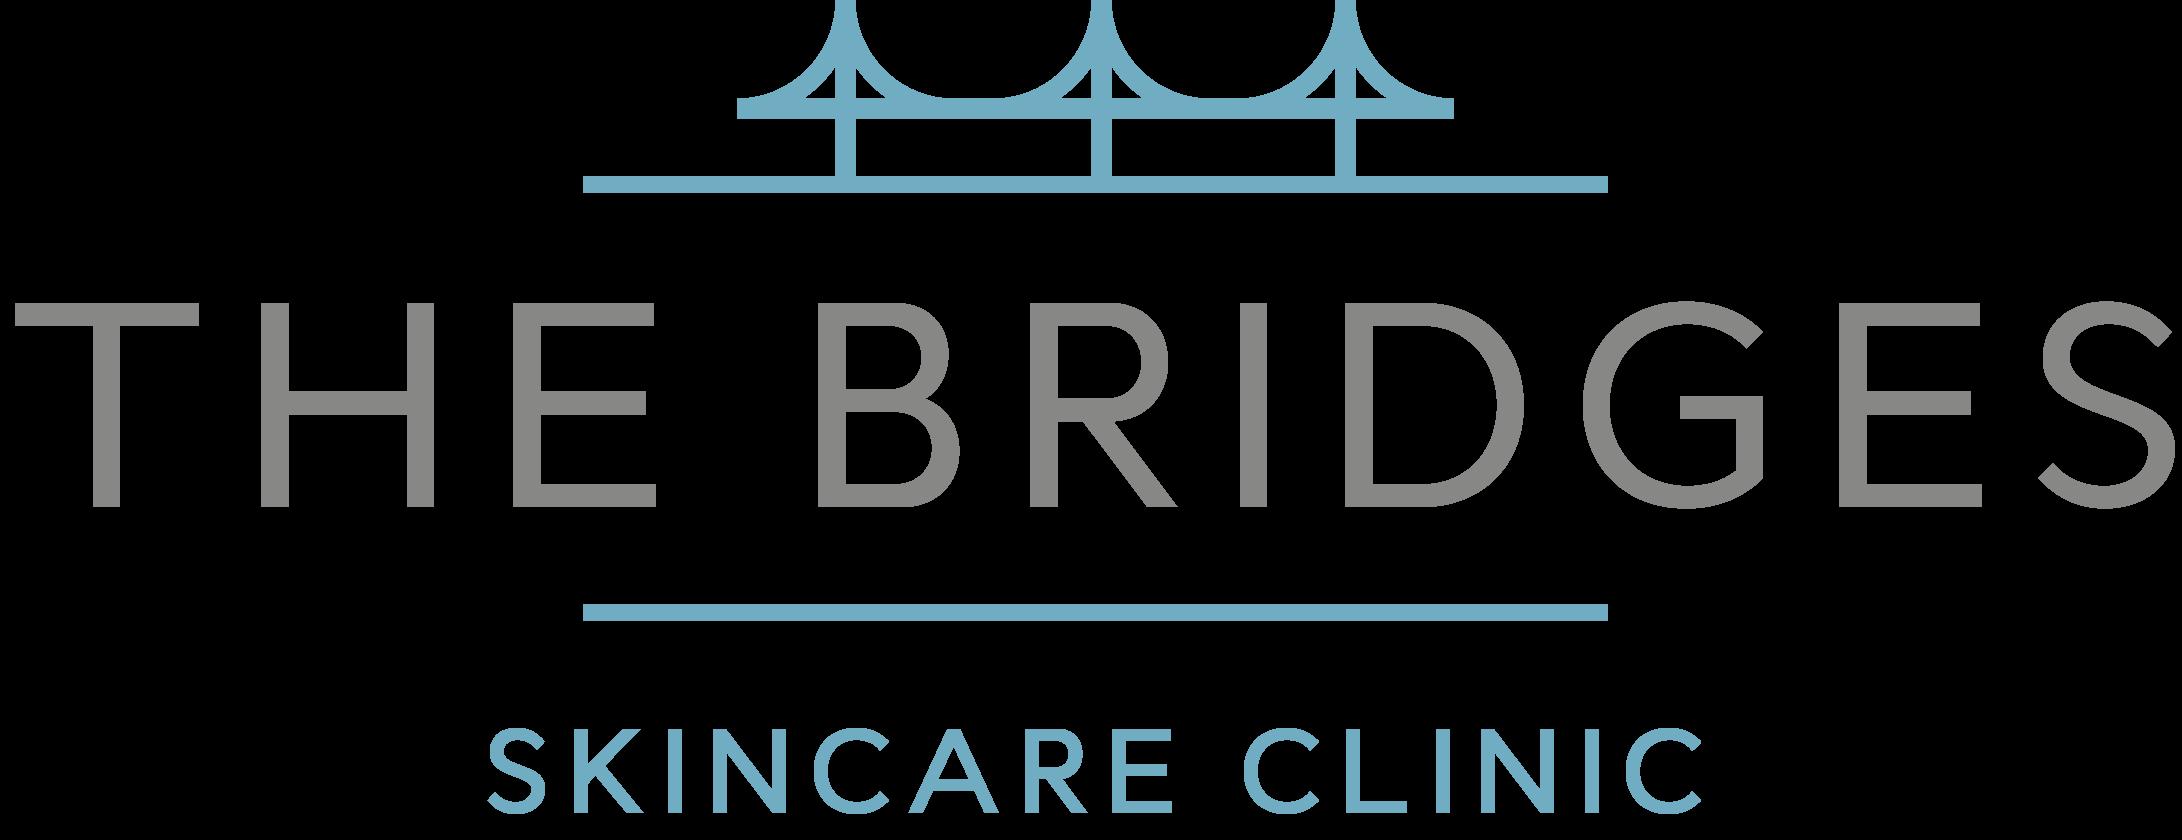 The Bridge Skincare Clinic